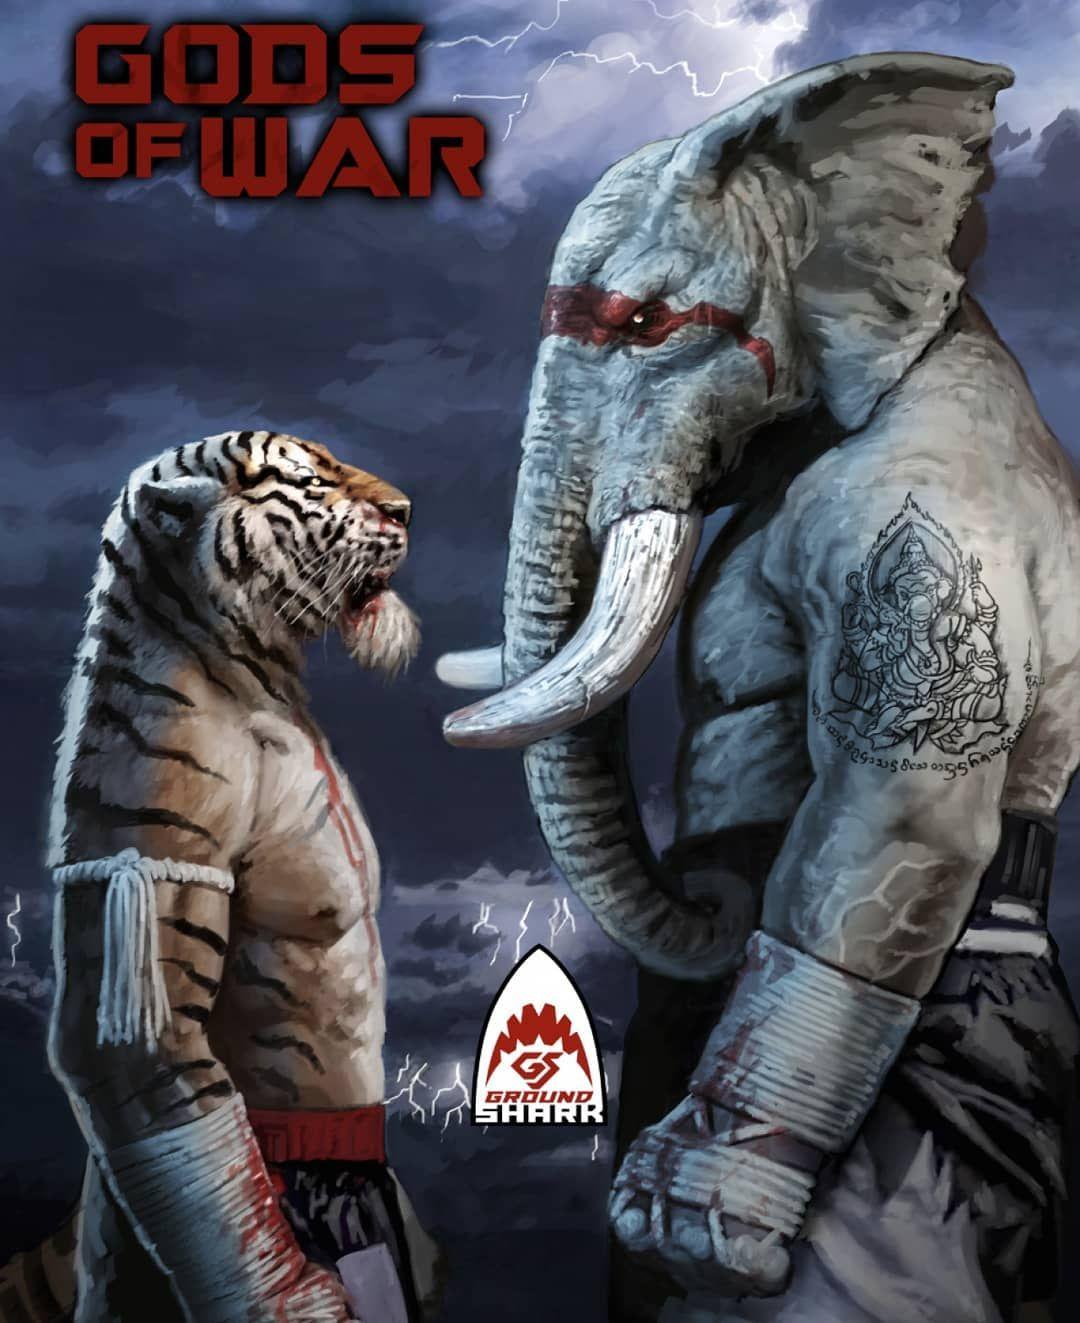 Who Will Win Groundshark11 Jiujitsu Bjj Mma Ufc Muaythai Kickboxing Boxing Martialarts Wrestling Fitne Muay Thai Combat Art Muay Boran